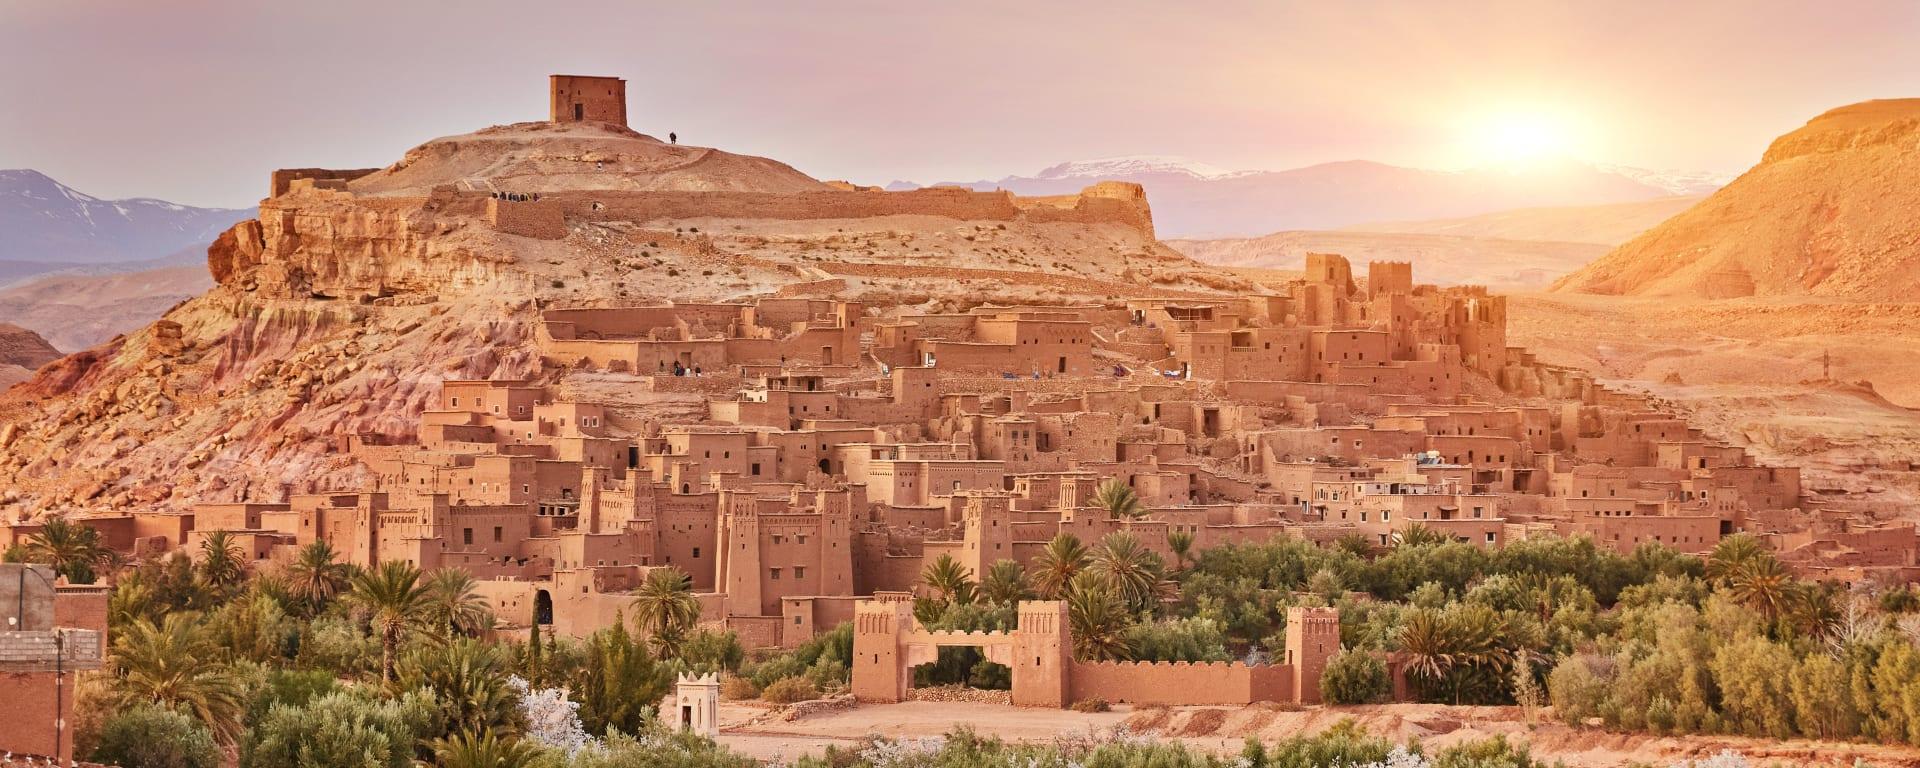 Kurztrip Süden ab Marrakesch: Marokko Ait Benhaddou